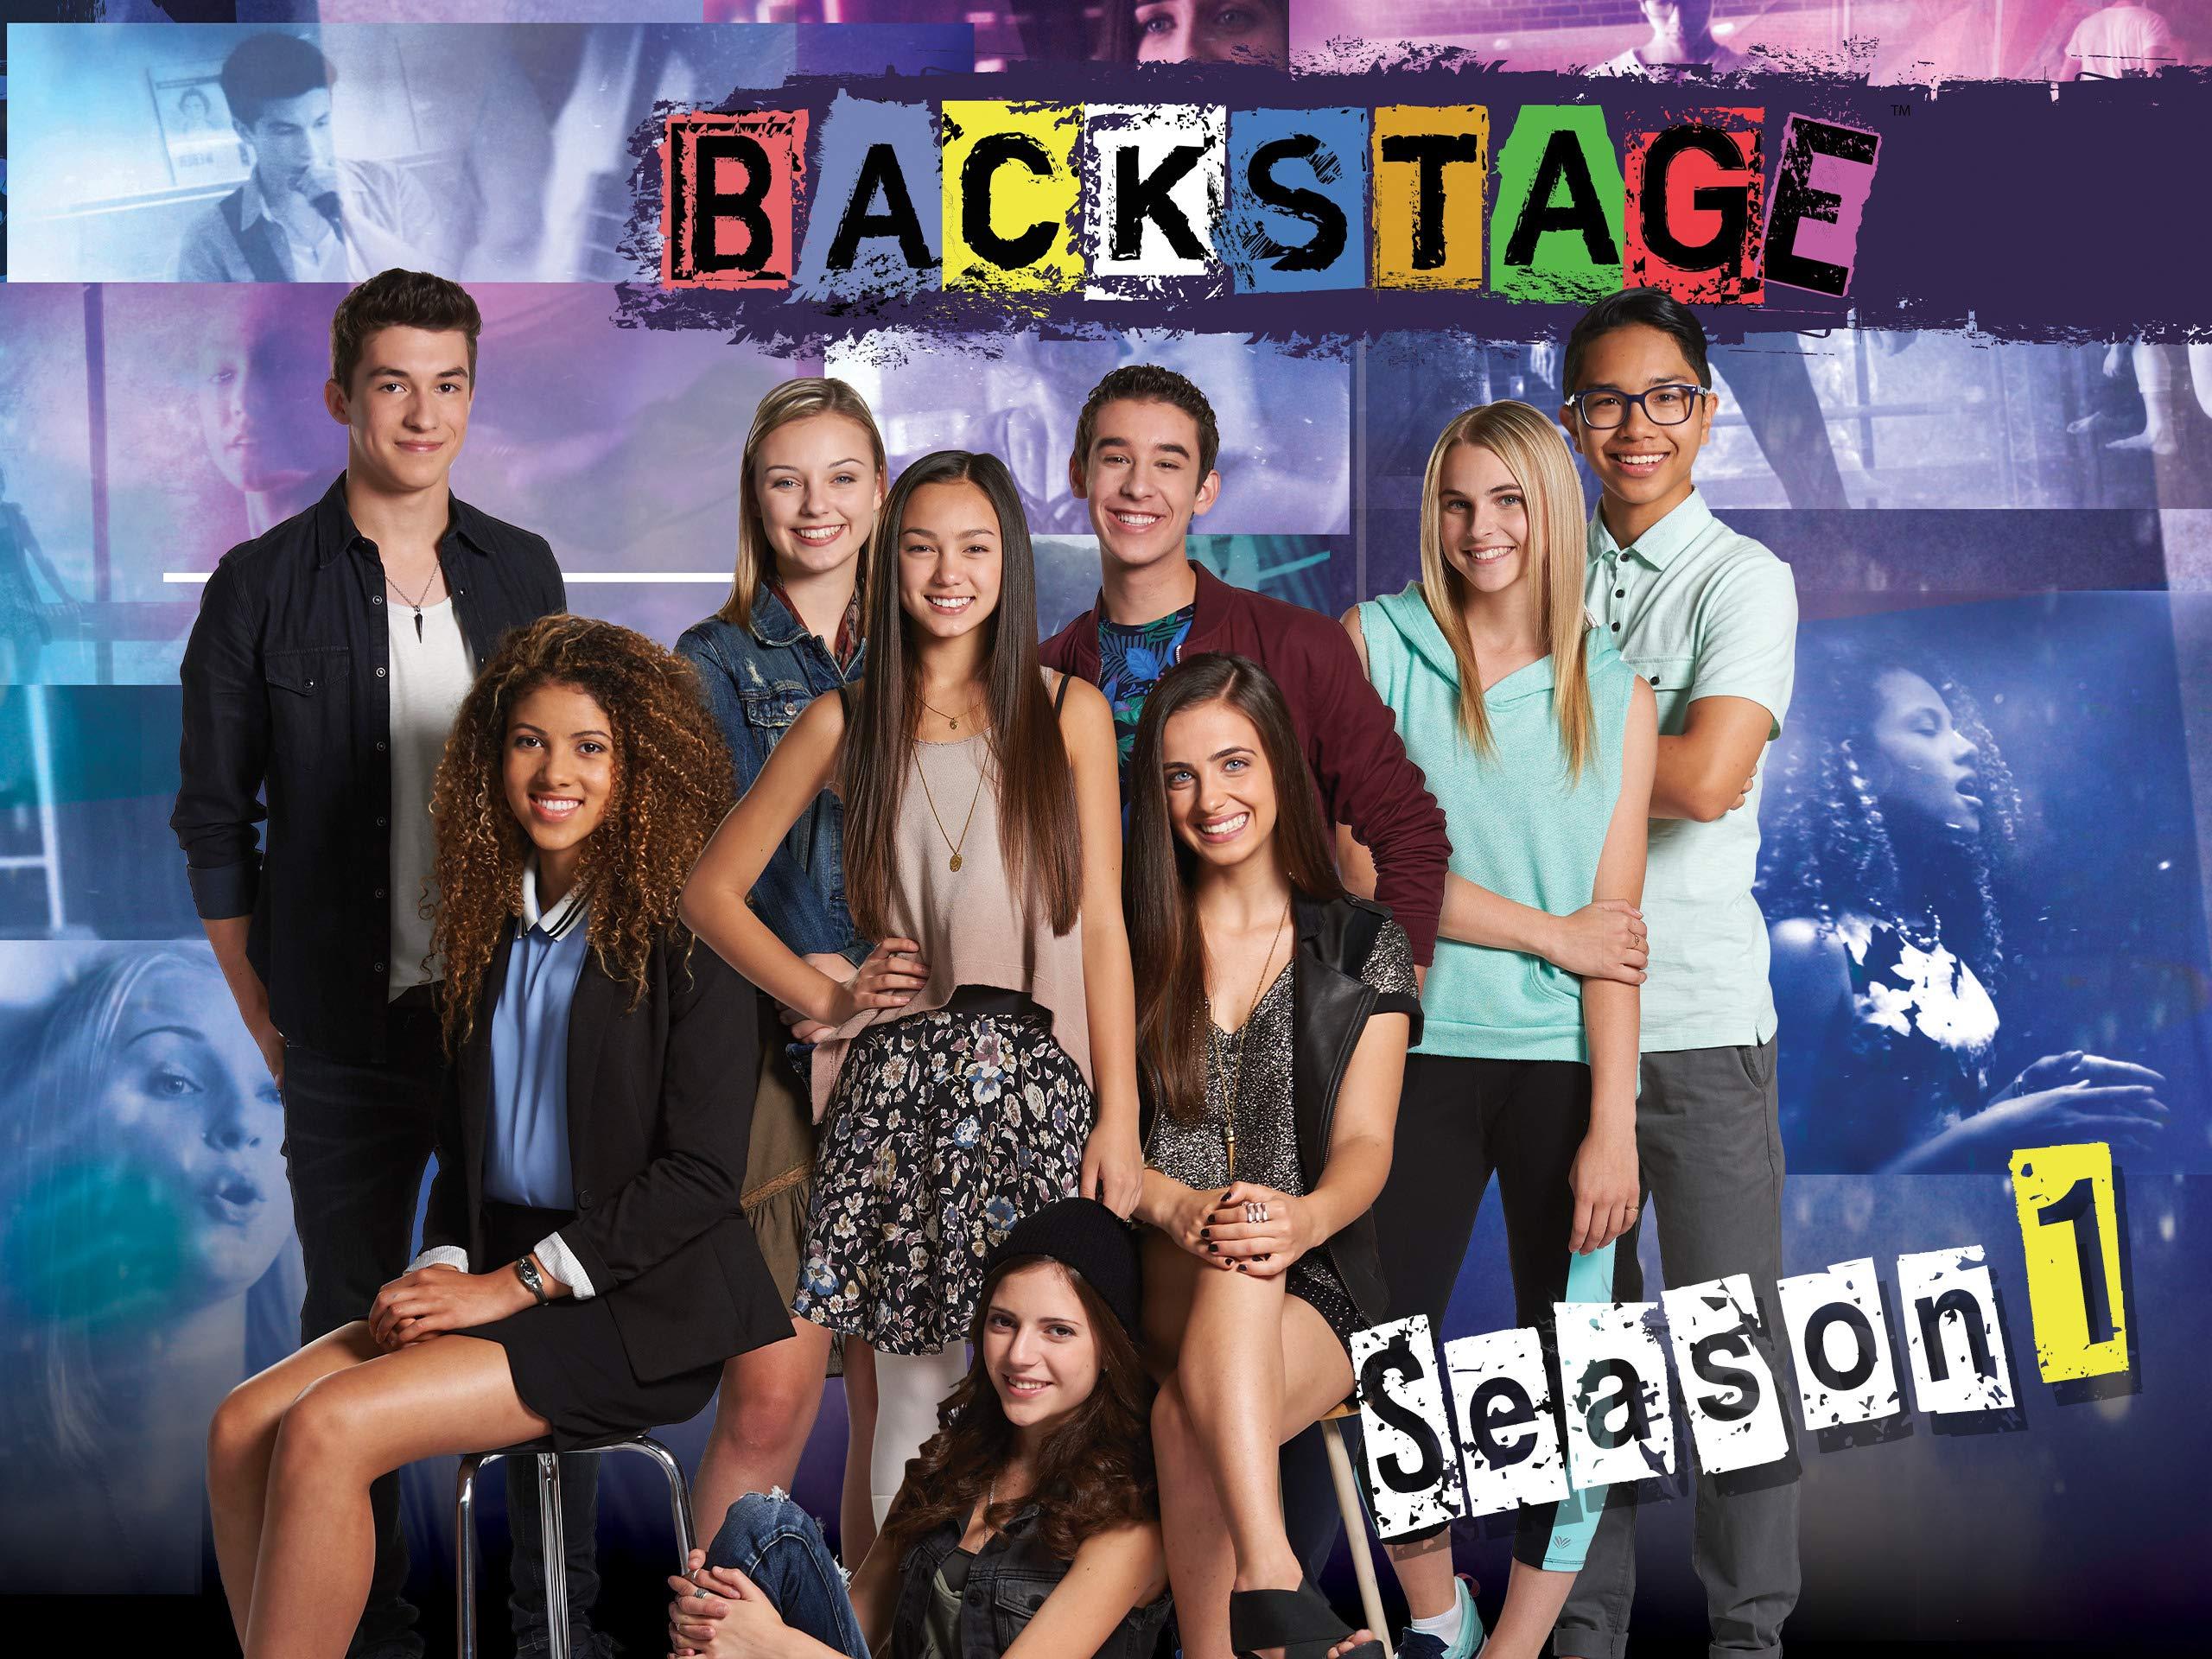 Backstage - Season 1